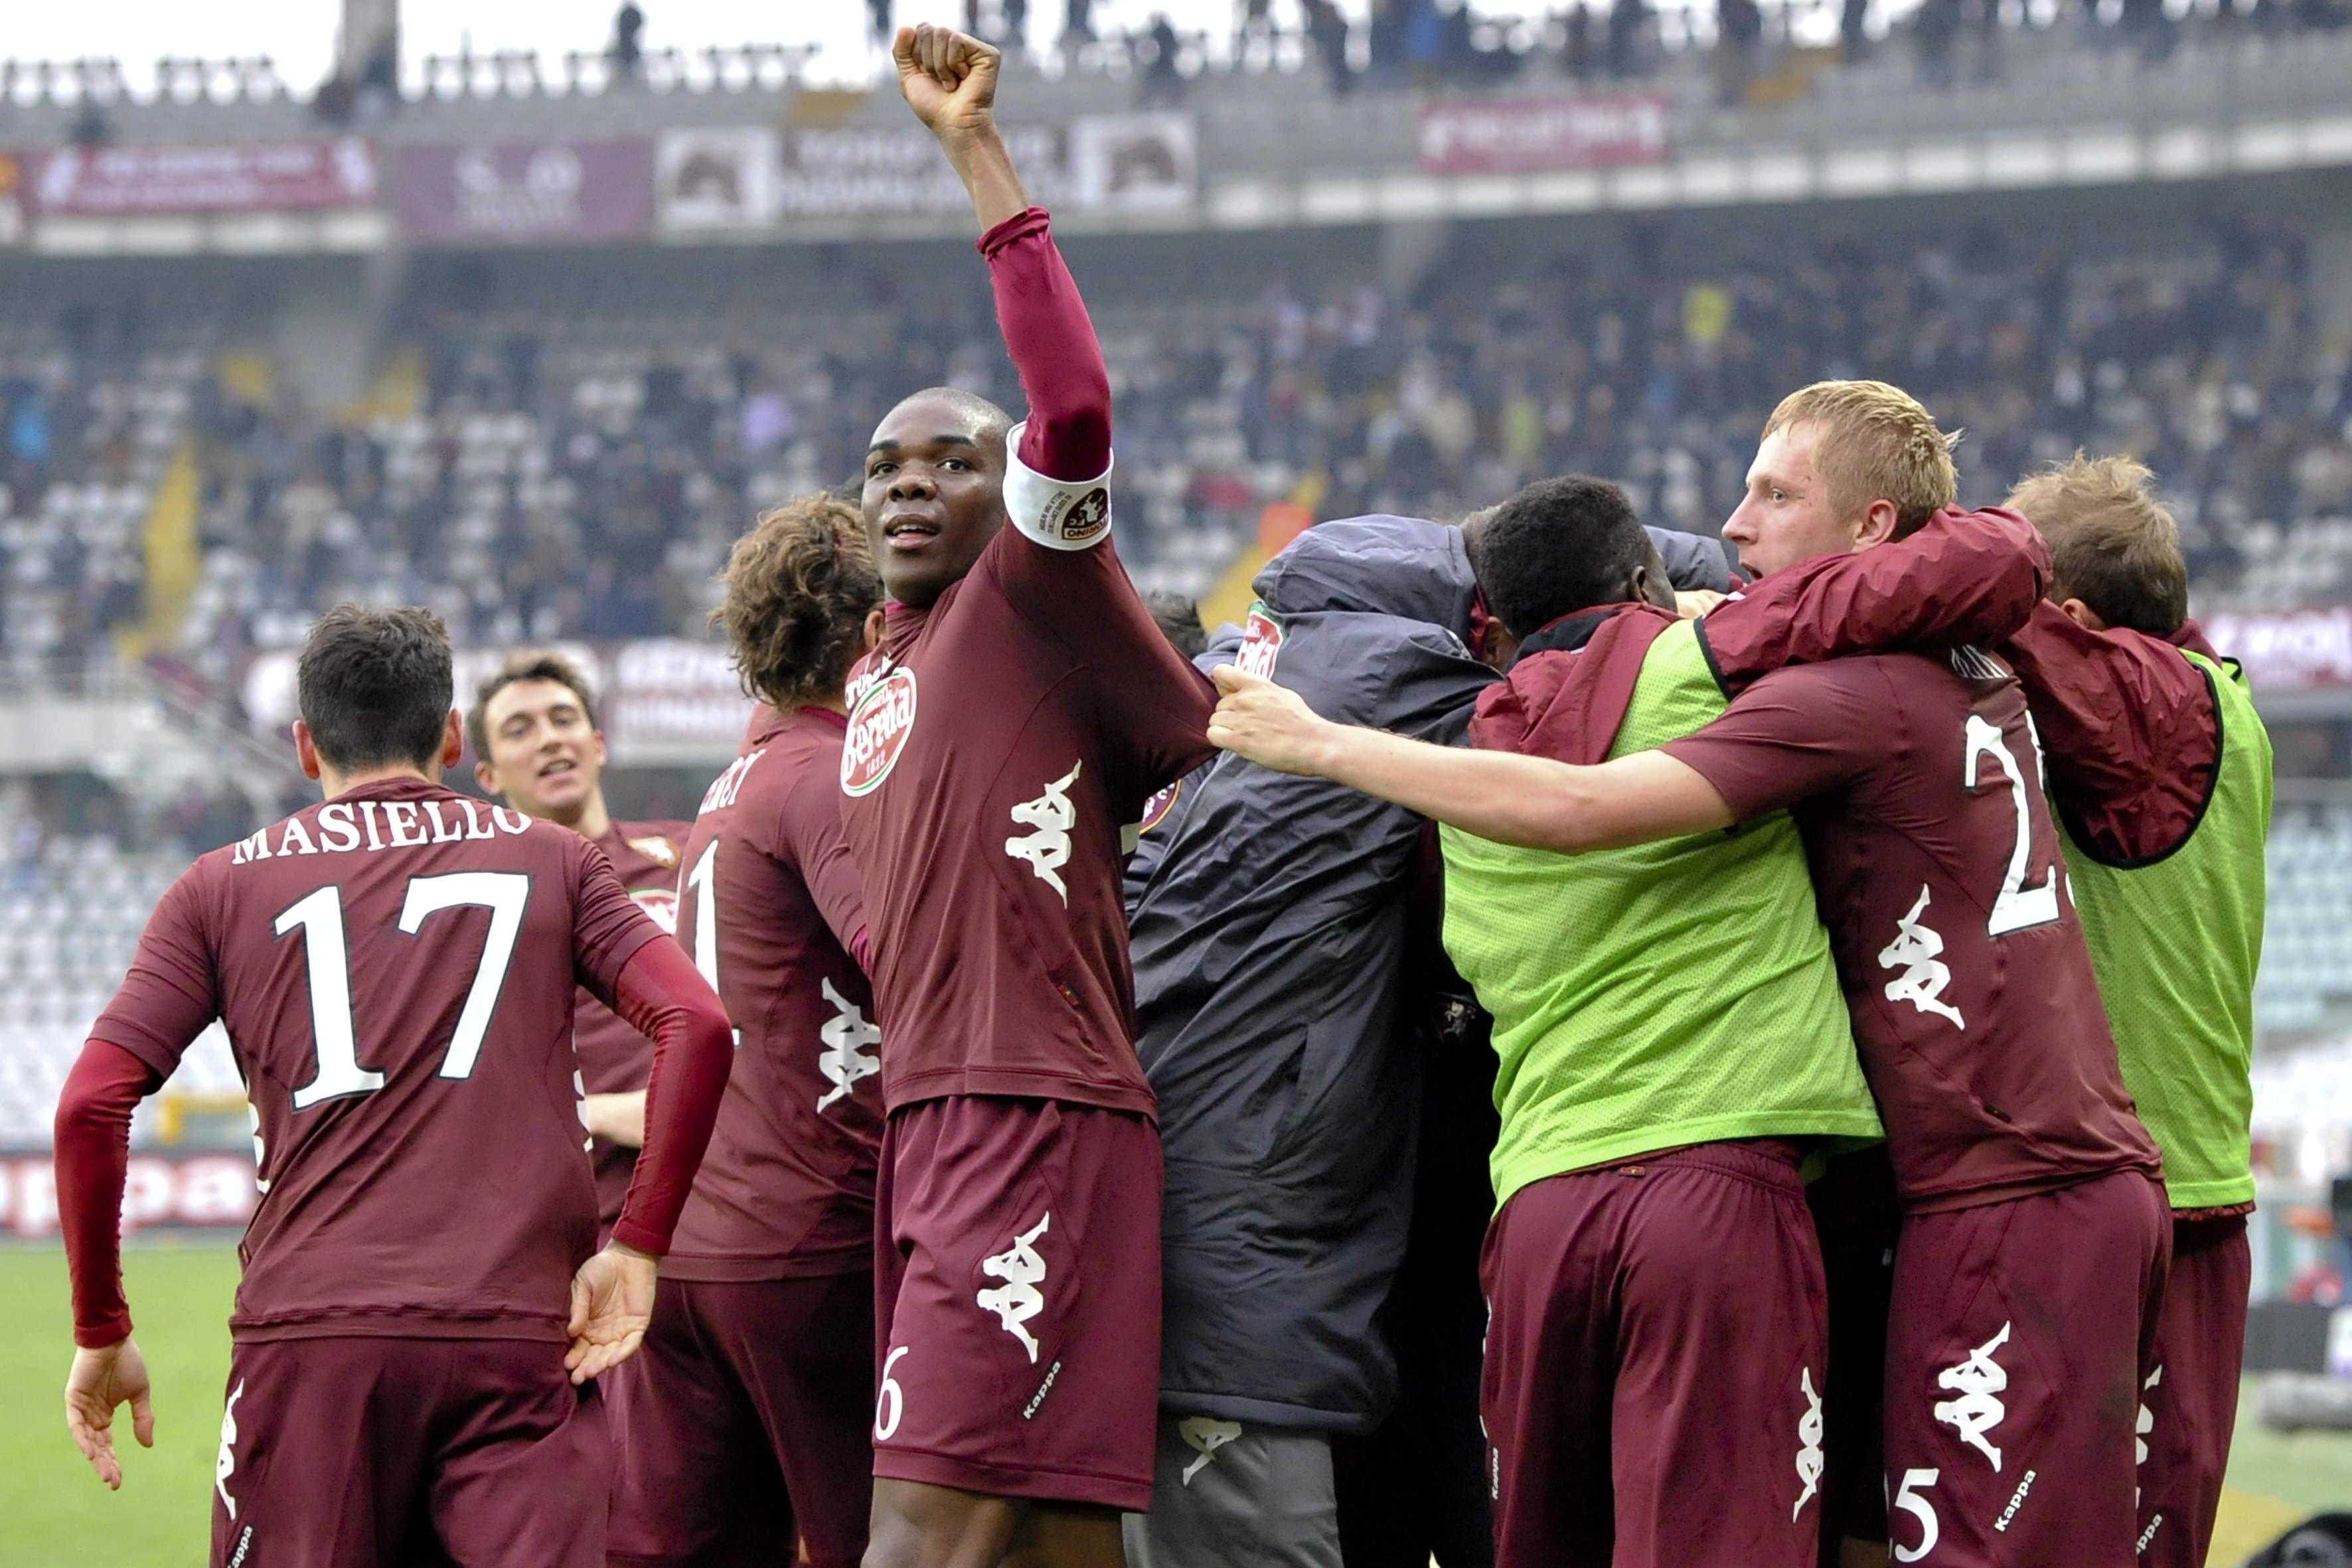 Serie A 2012/13, Torino-Atalanta, Ogbonna (AP/LaPresse)